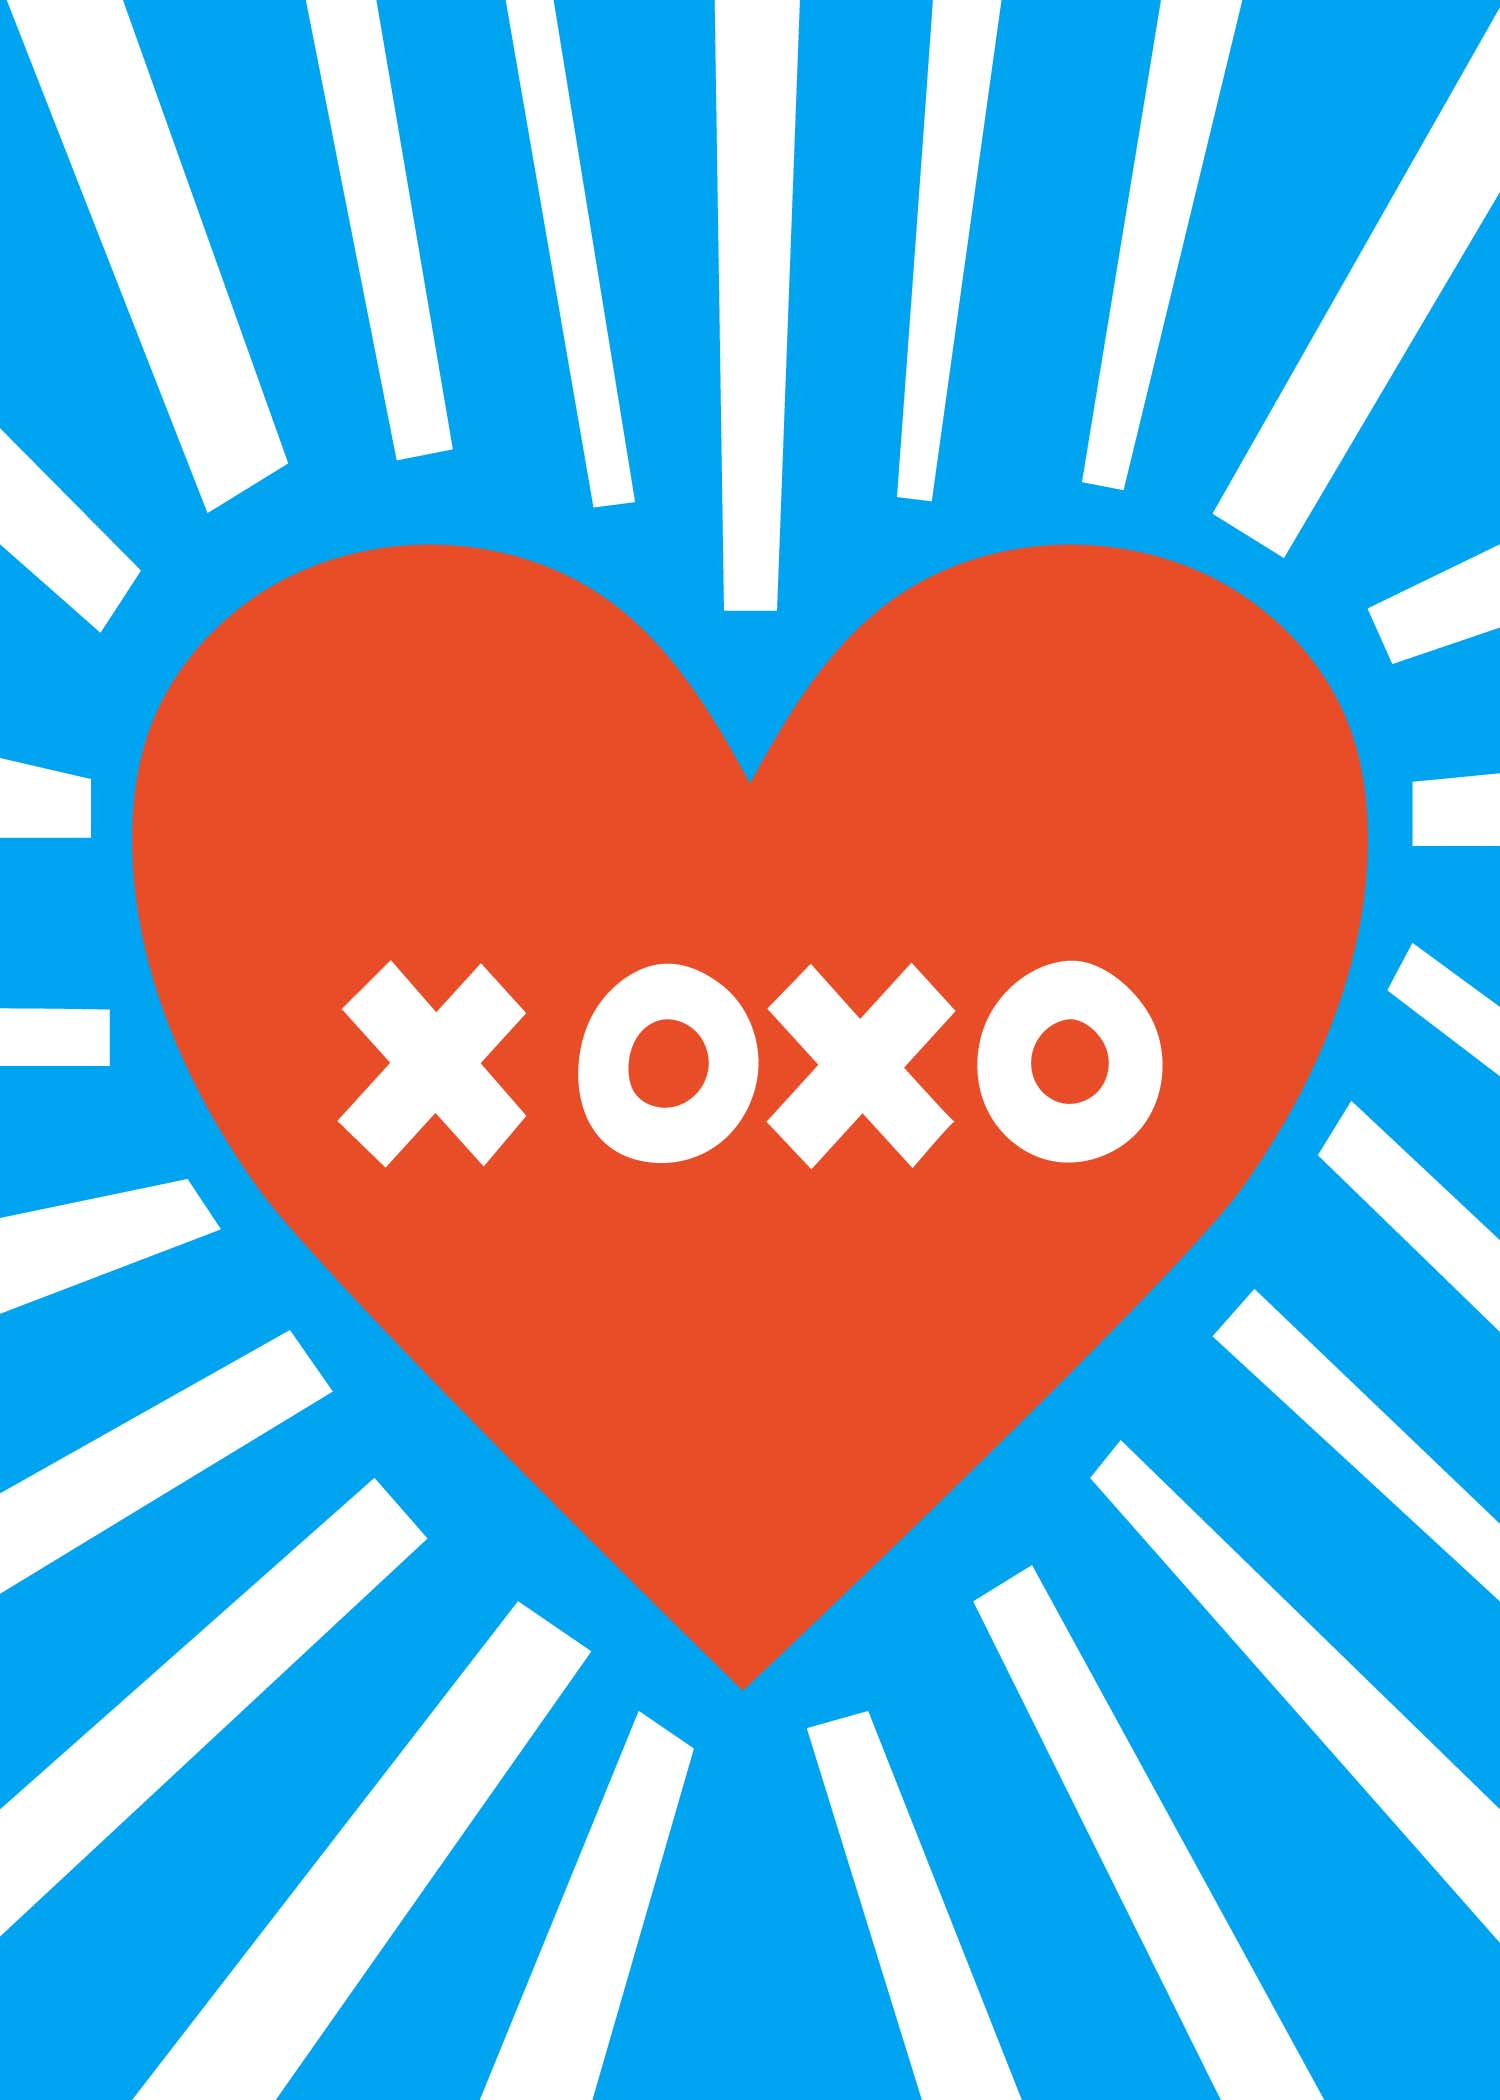 XOXO_blue_LR.jpg